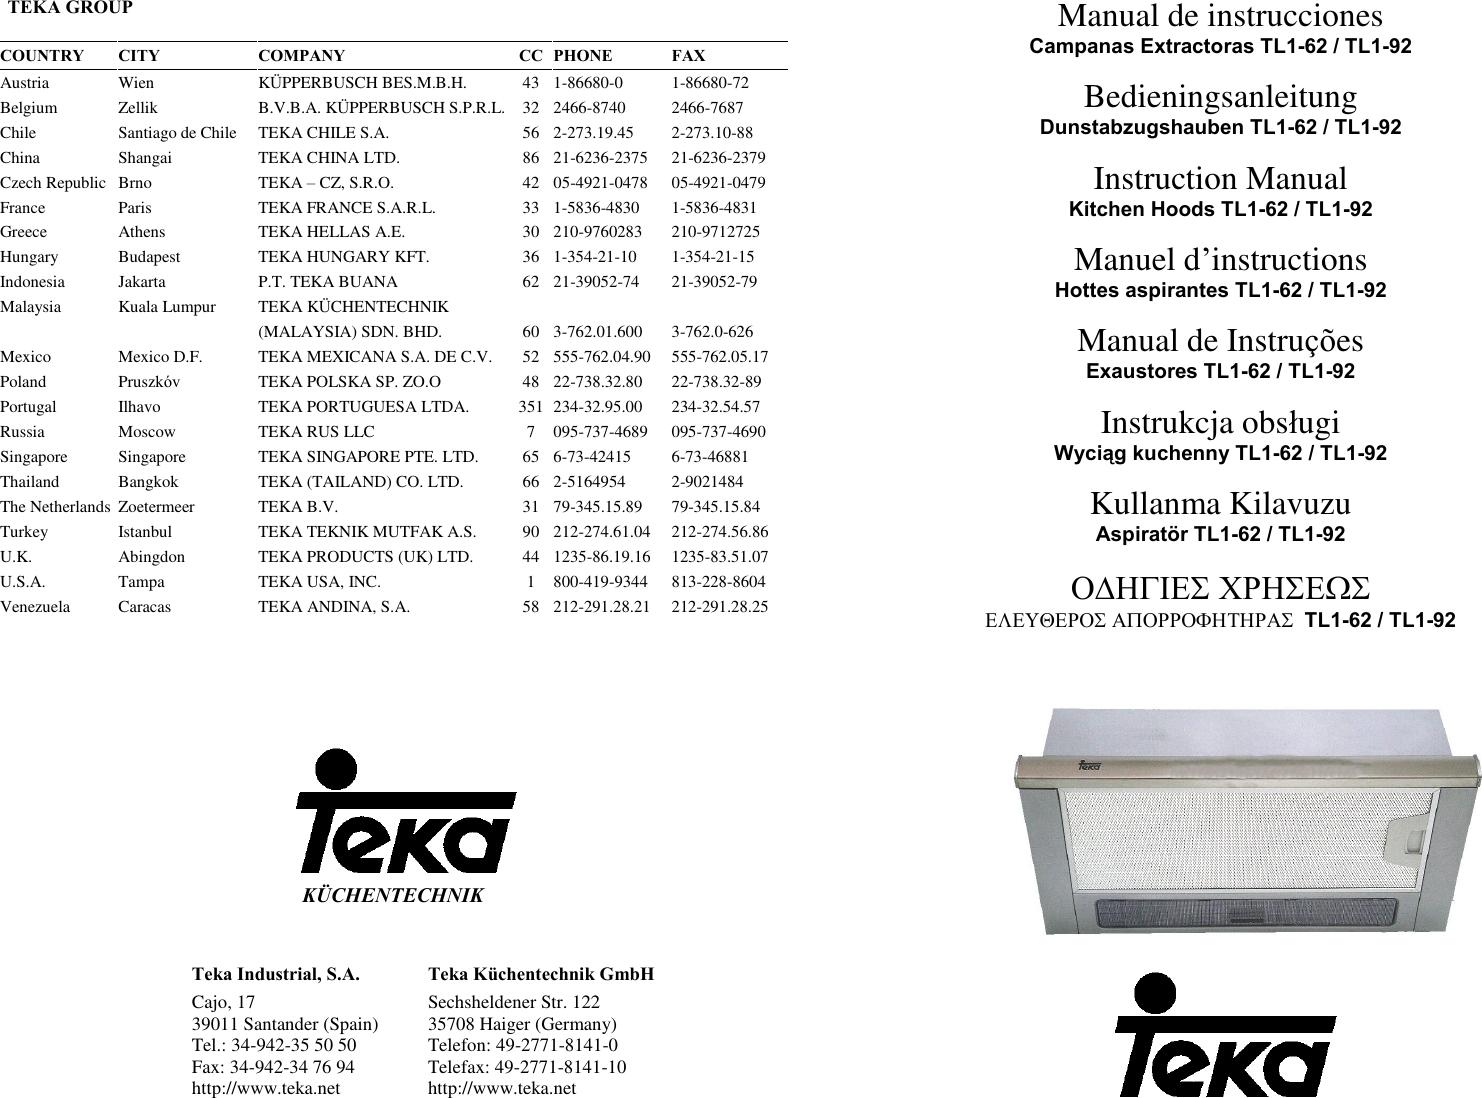 Teka Kitchen Hoods Tl1 62 Users Manual O1